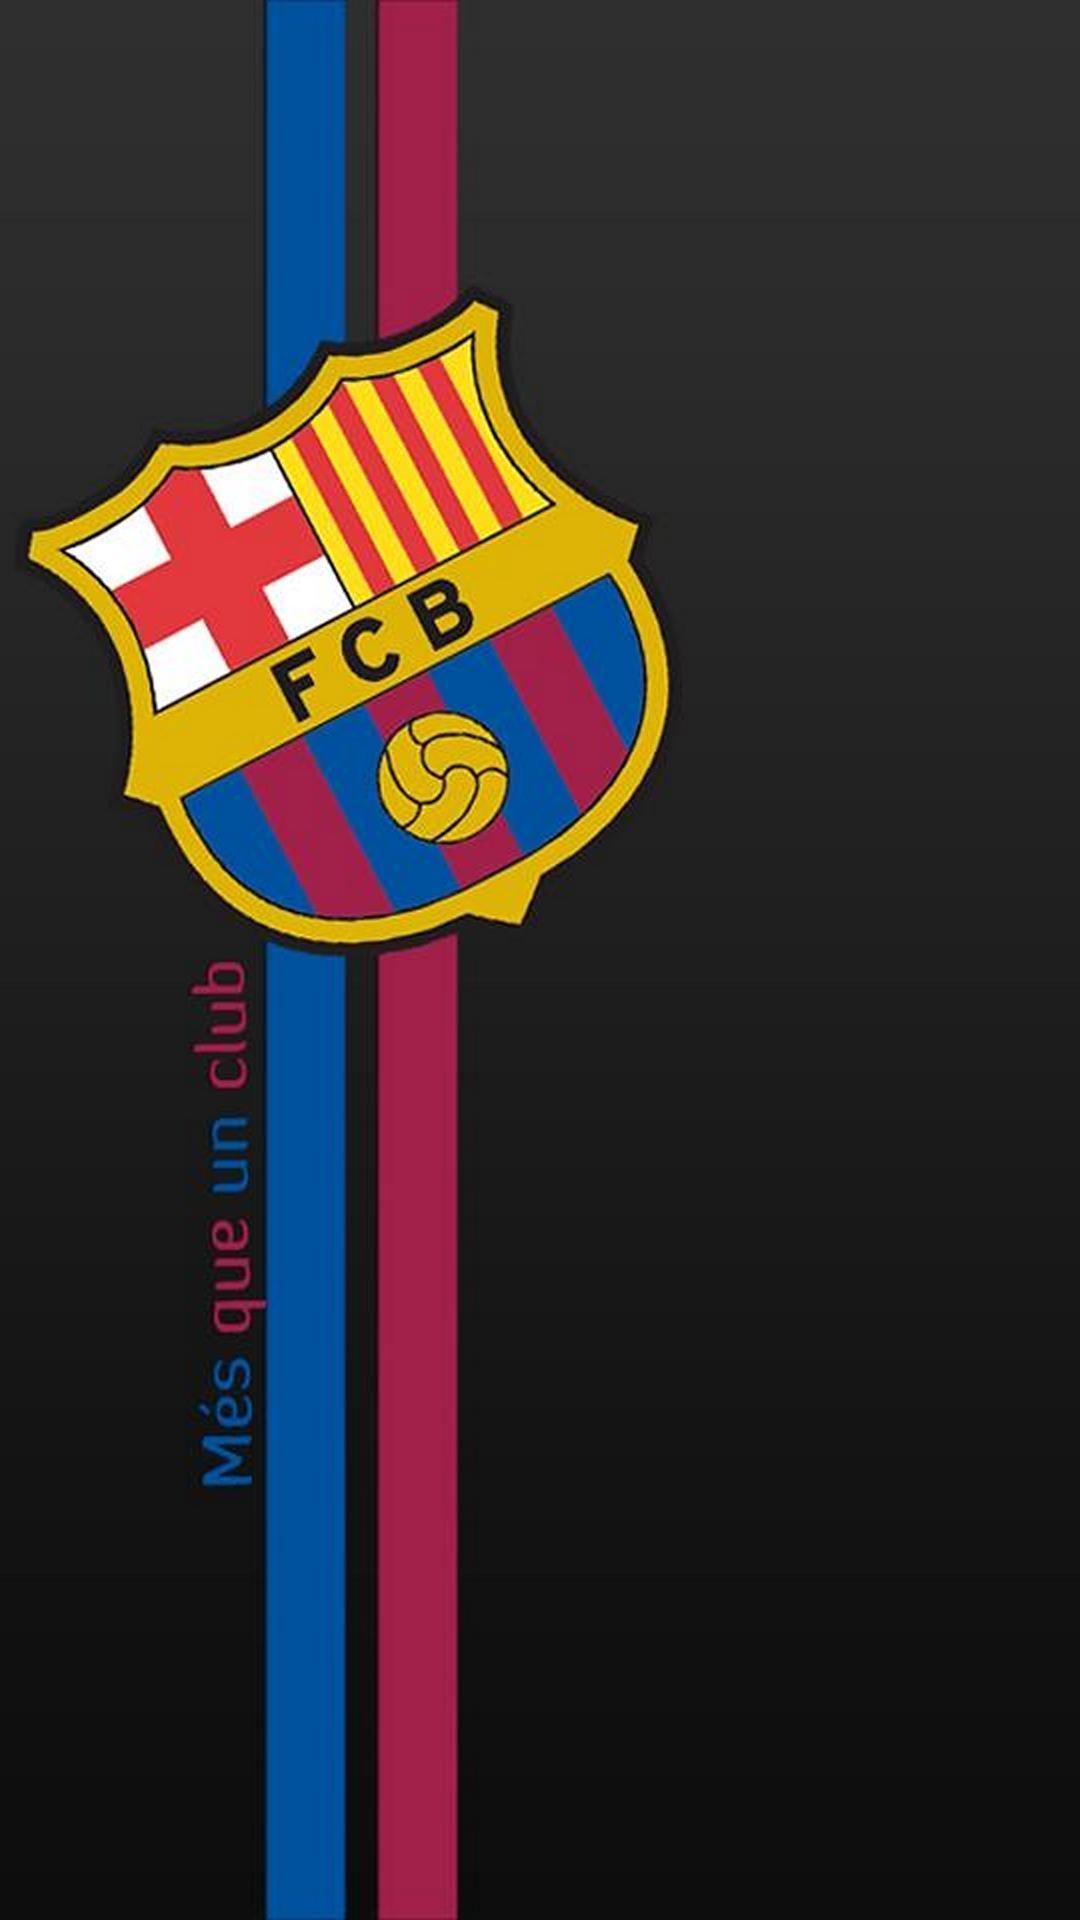 Art Barcelona Logo Iphone 5 Fc Barcelona Wallpaper Hd Android 1080x1920 Download Hd Wallpaper Wallpapertip